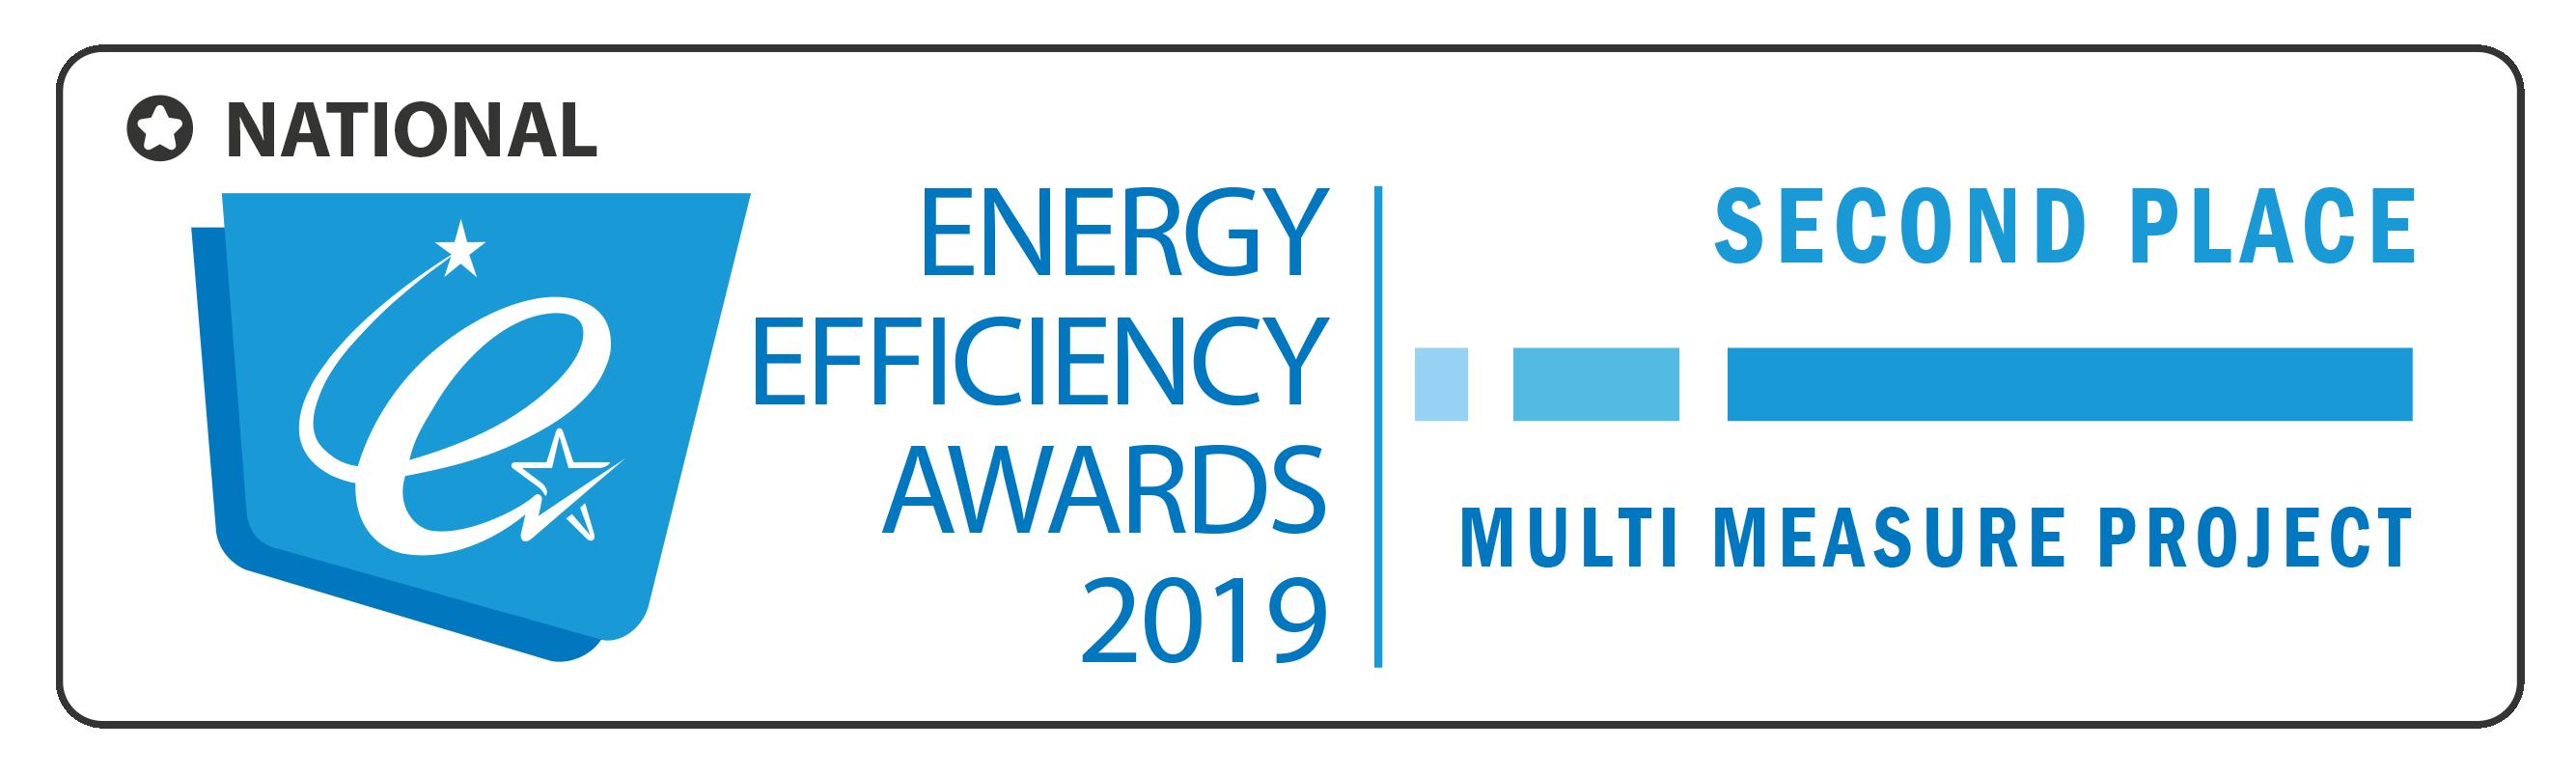 2019 National Energy Efficiency Awards